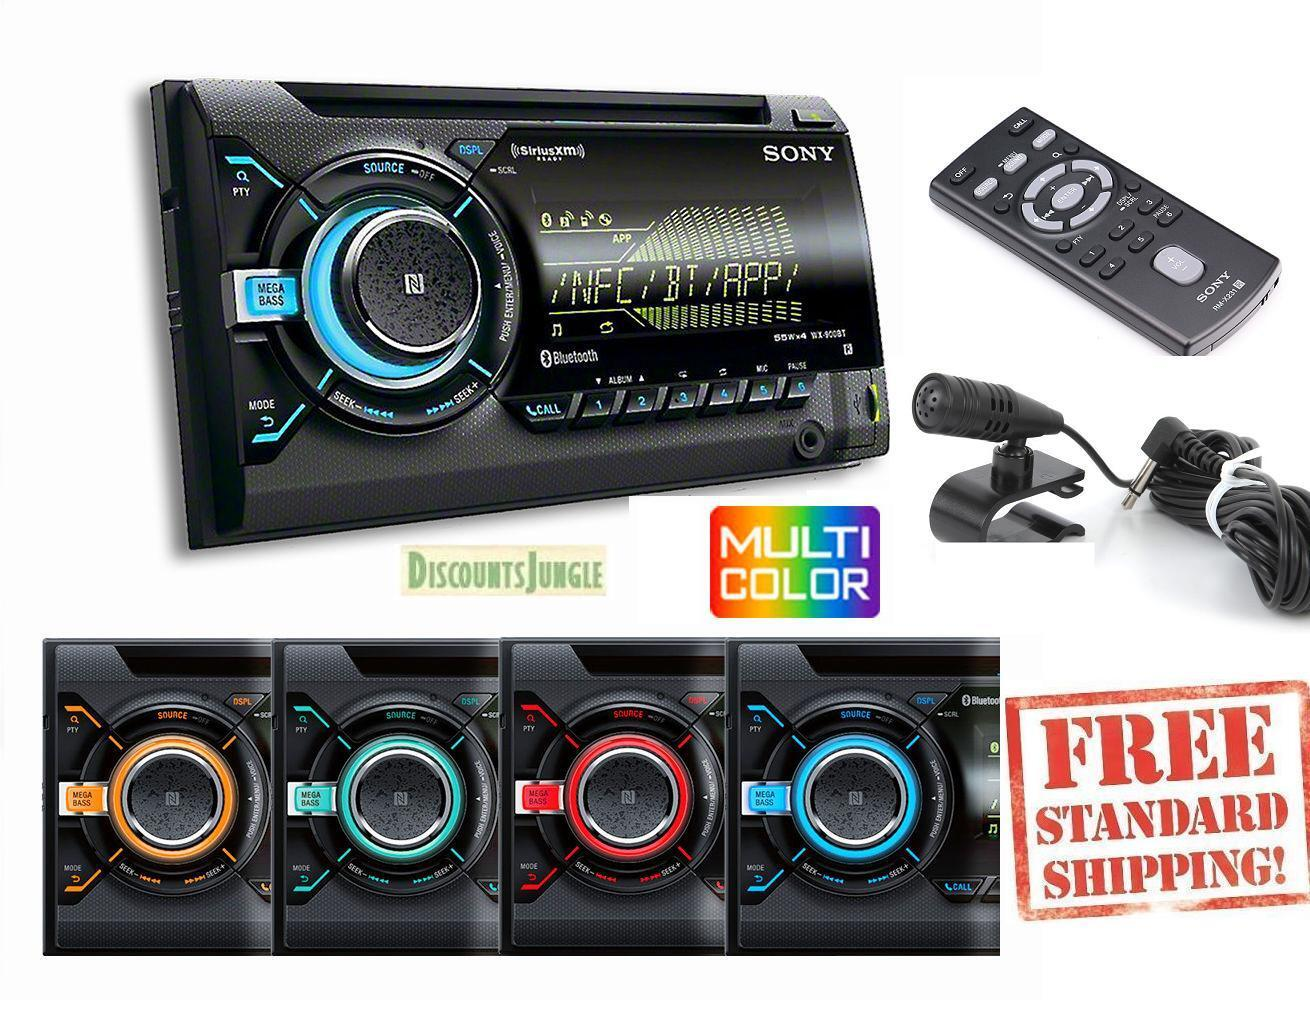 $99.90 - Sony WX900BT Double Din CD Player Car Radio Bluetooth Pandora Iphone USB AUX